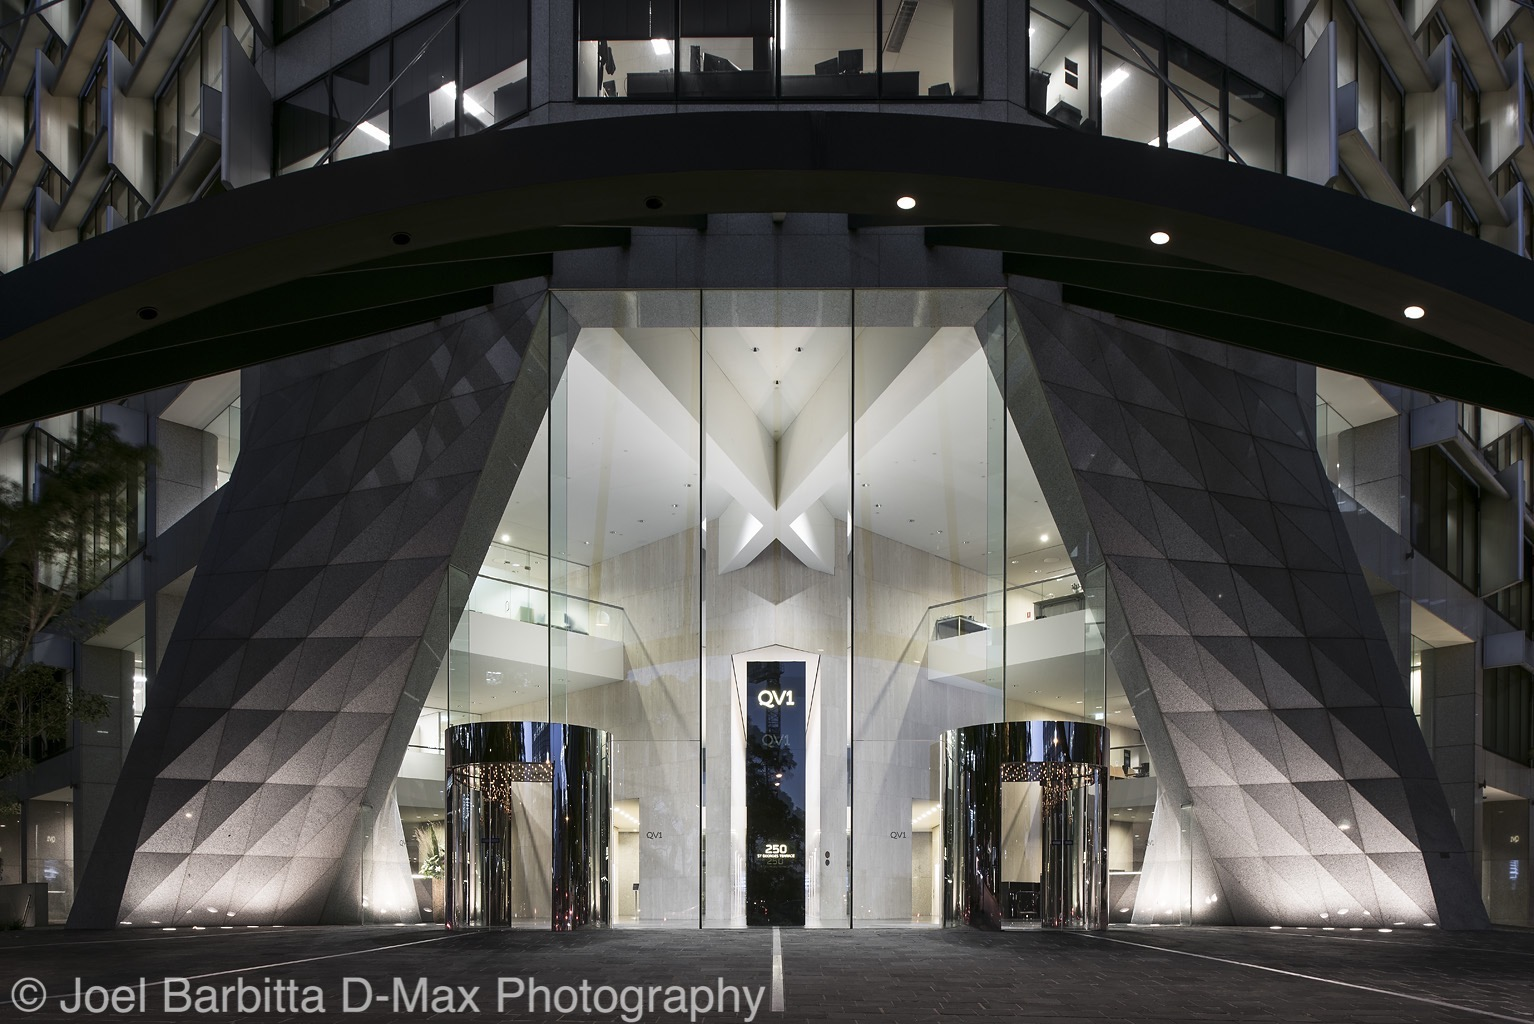 Dmax-QV1-002.jpg